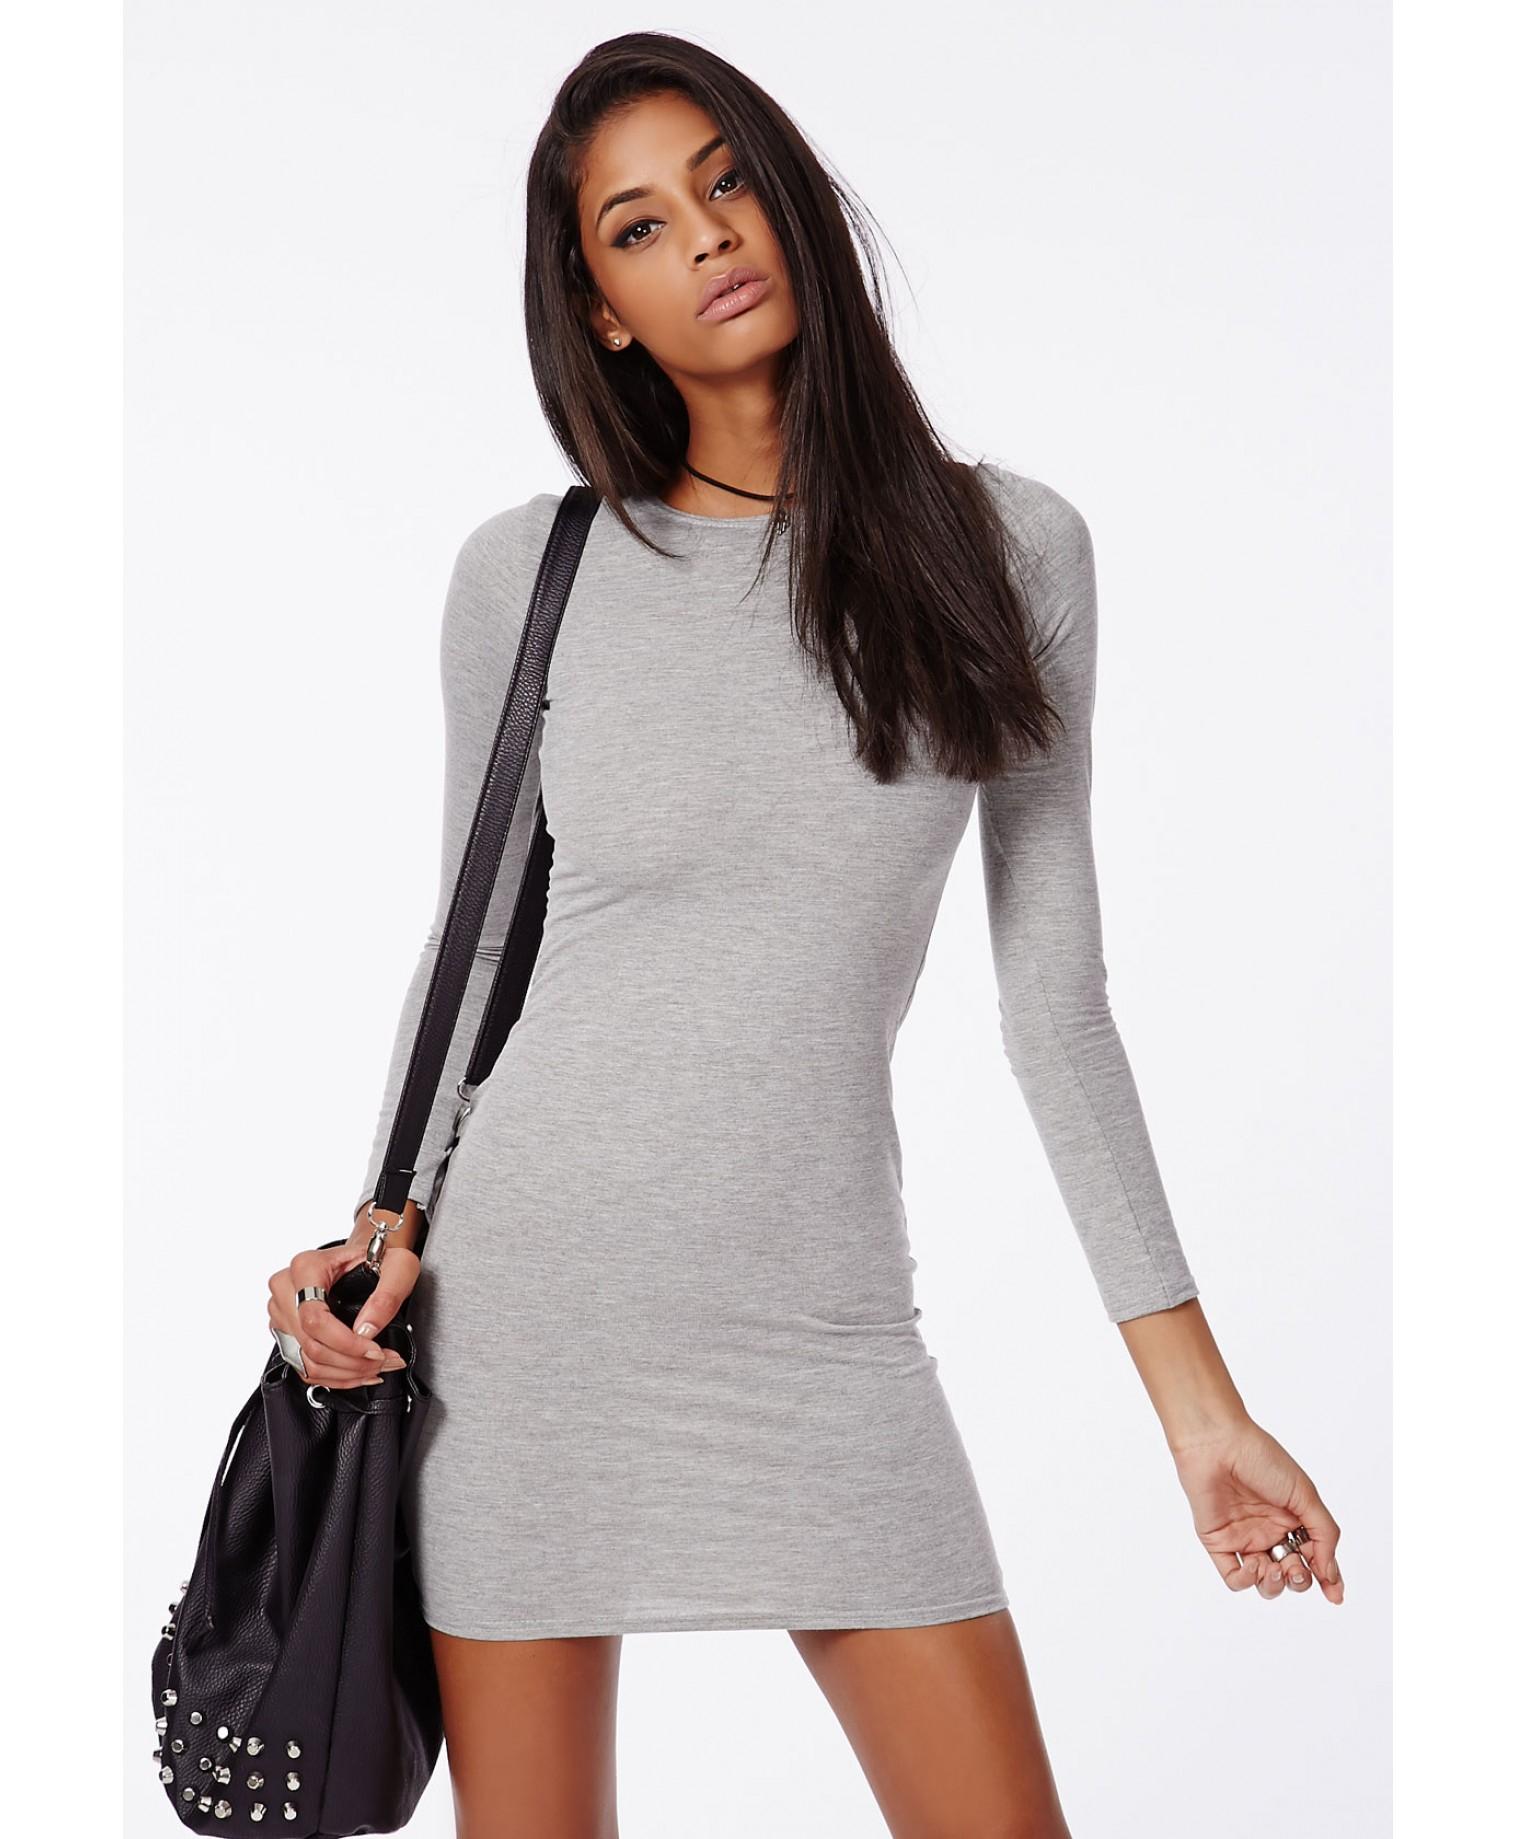 Grey Dress: Missguided Rainey Long Sleeve Bodycon Dress Grey In Gray